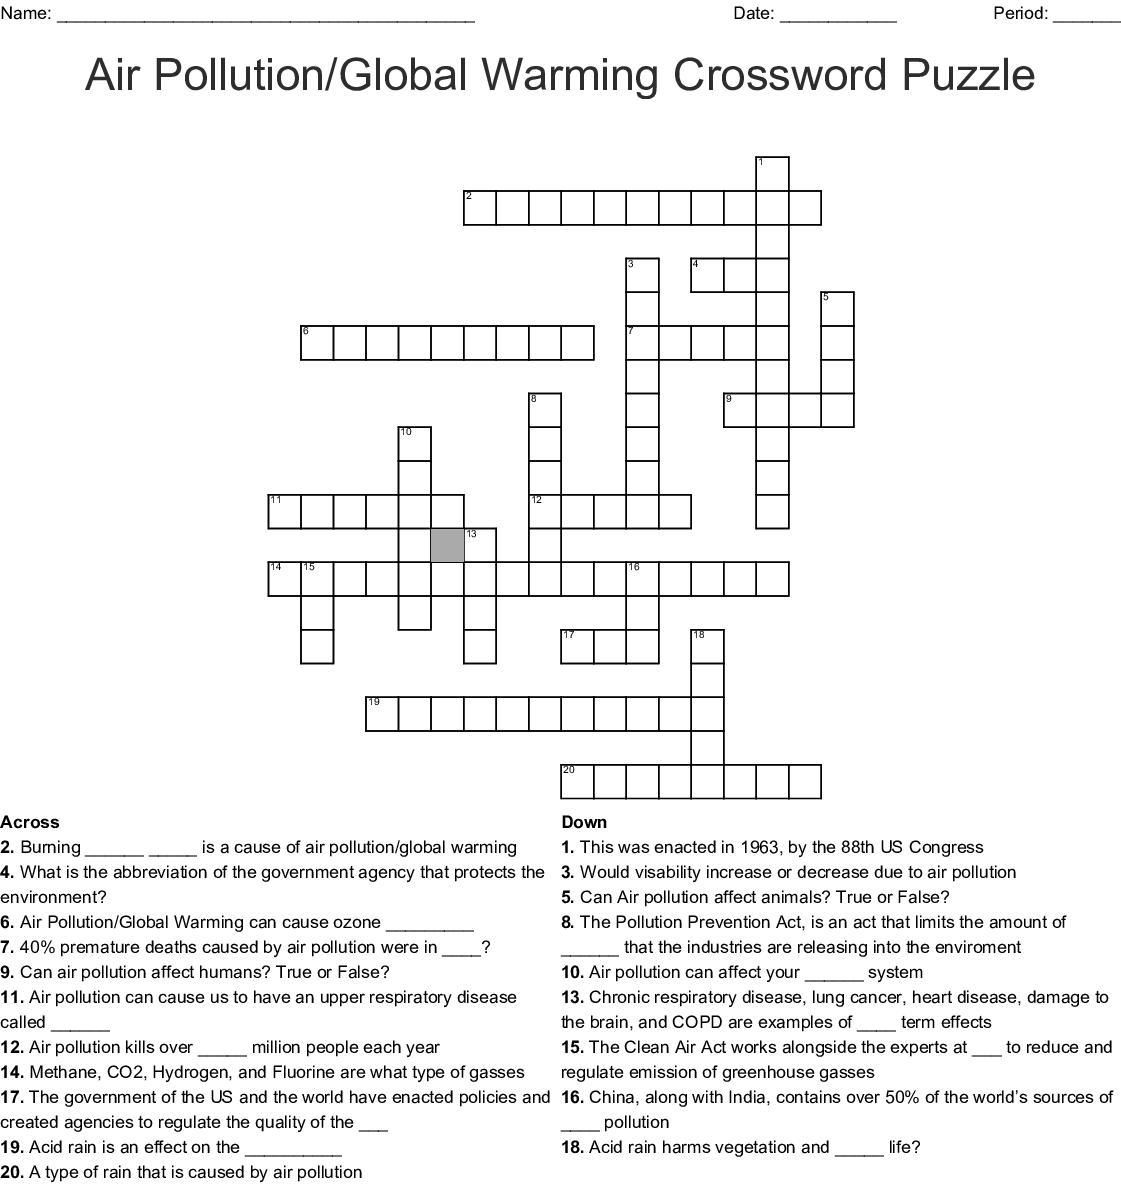 Fuel System Crossword